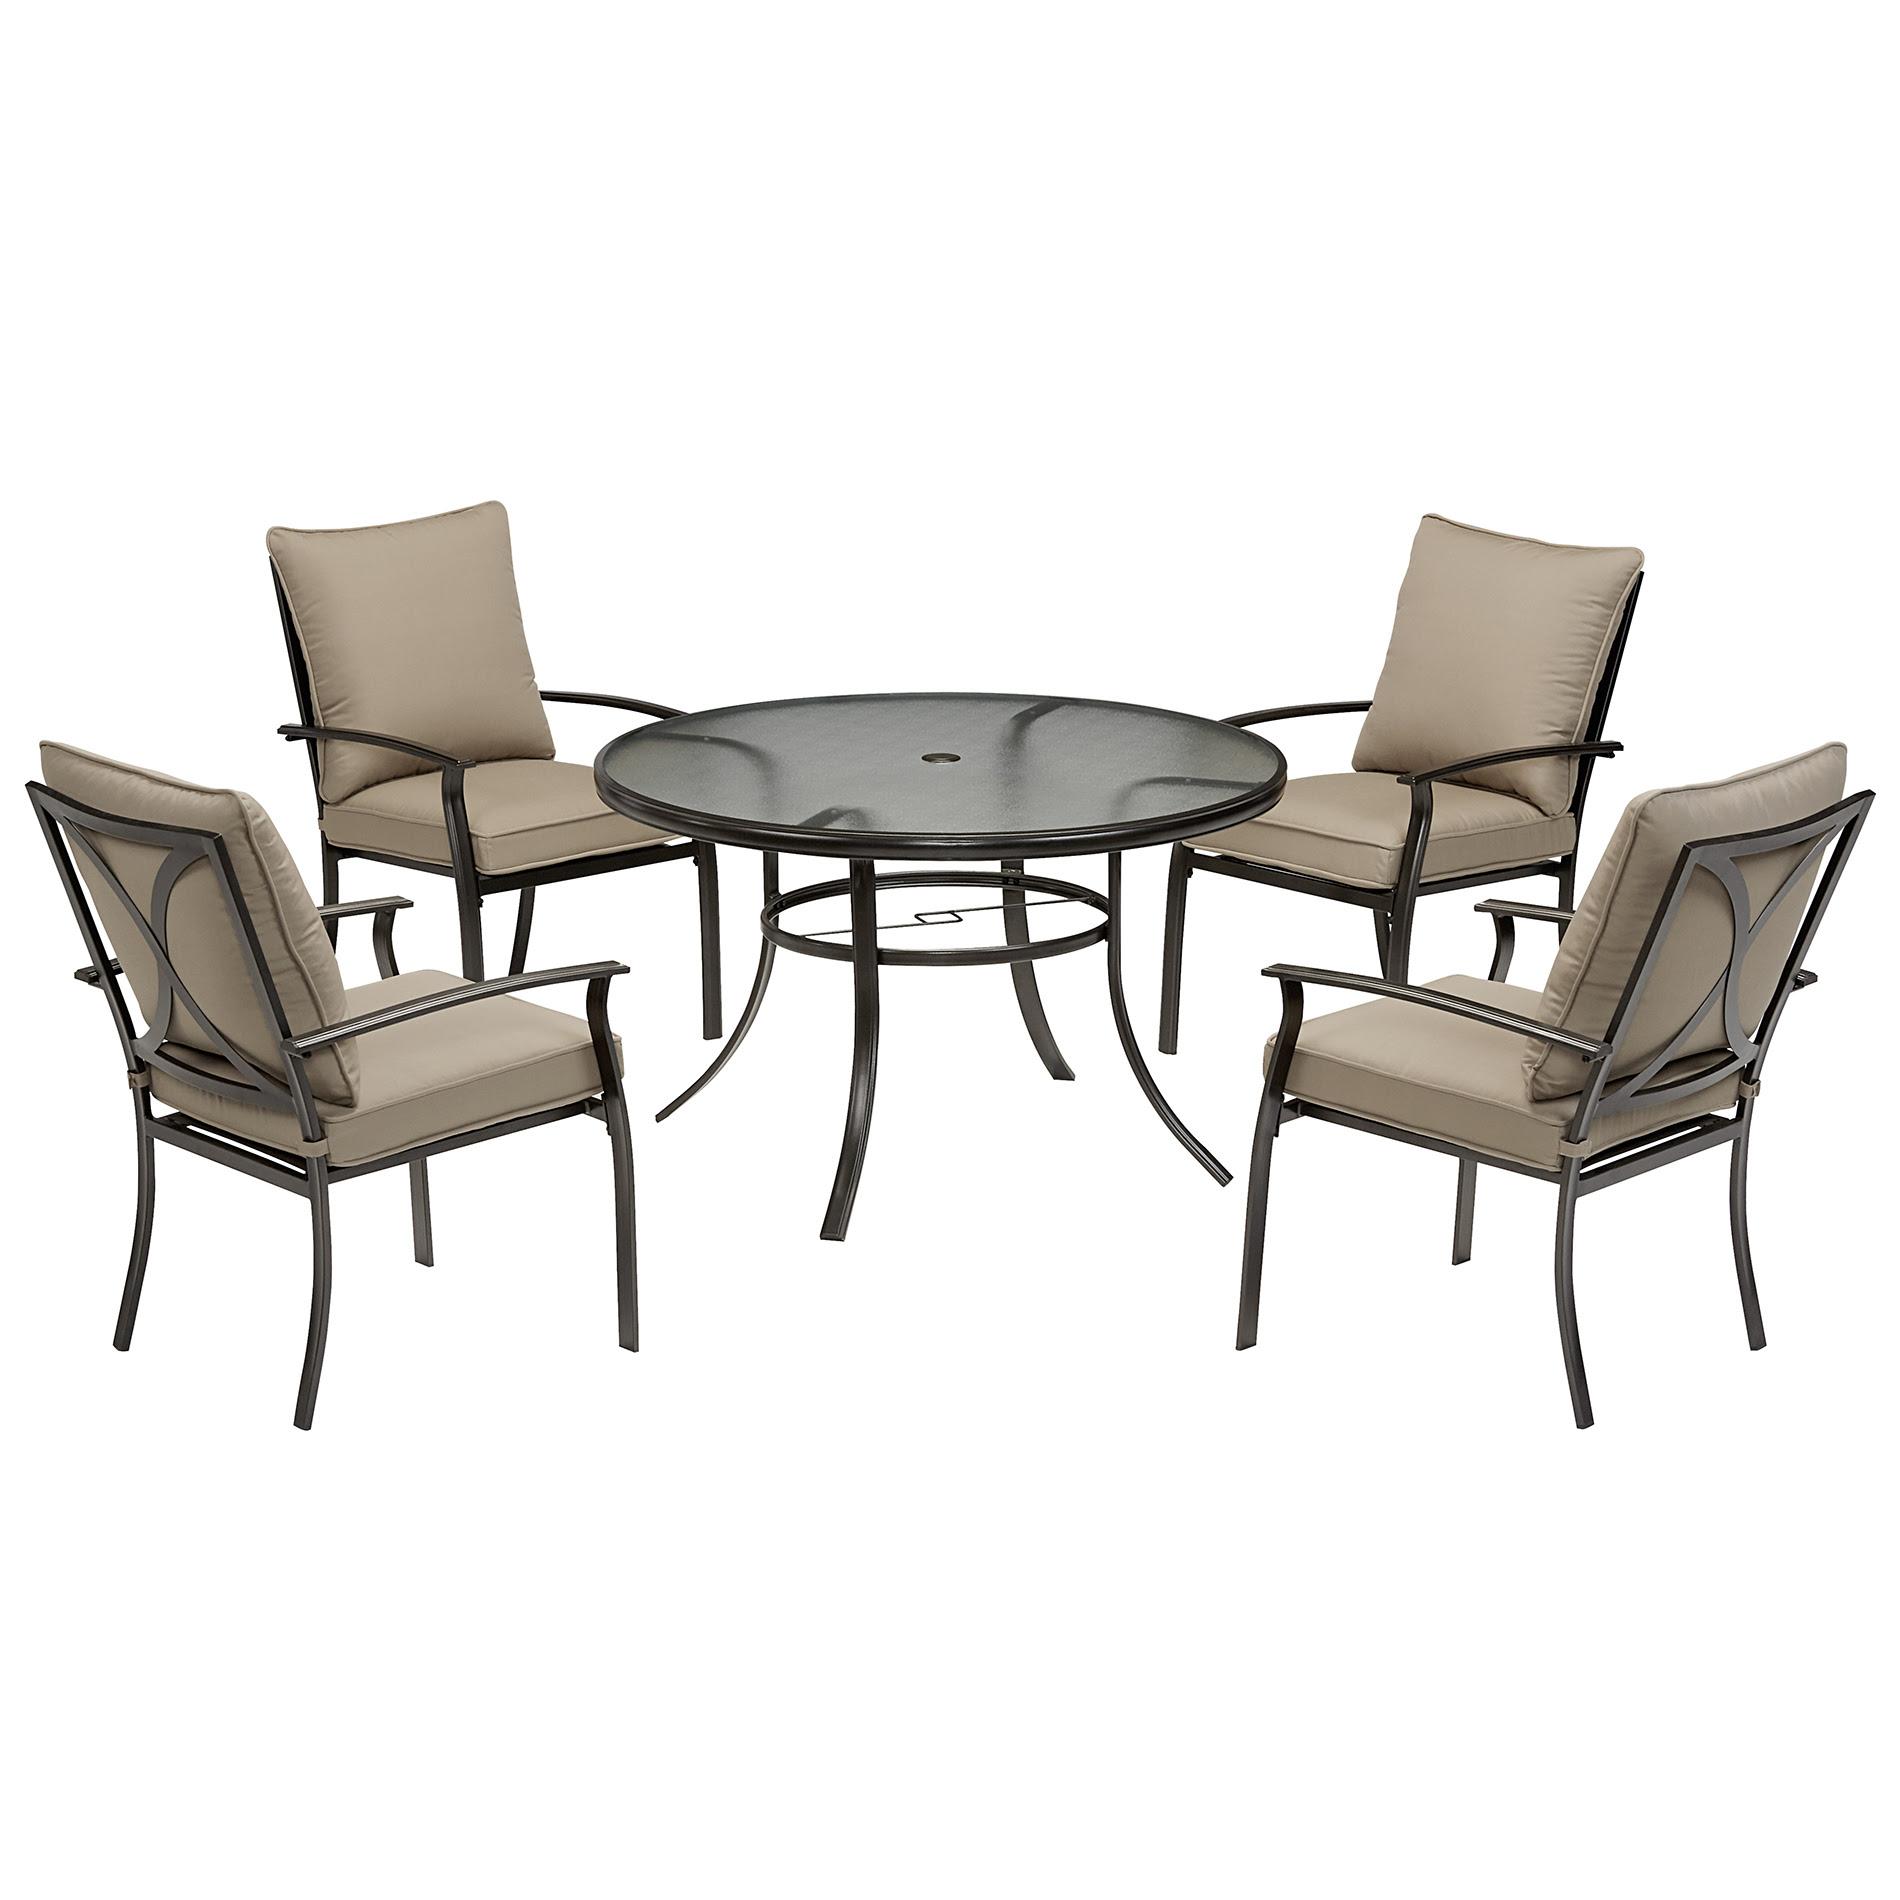 Garden Oasis Harrison 5 Piece Cushion Dining Set - Tan ...